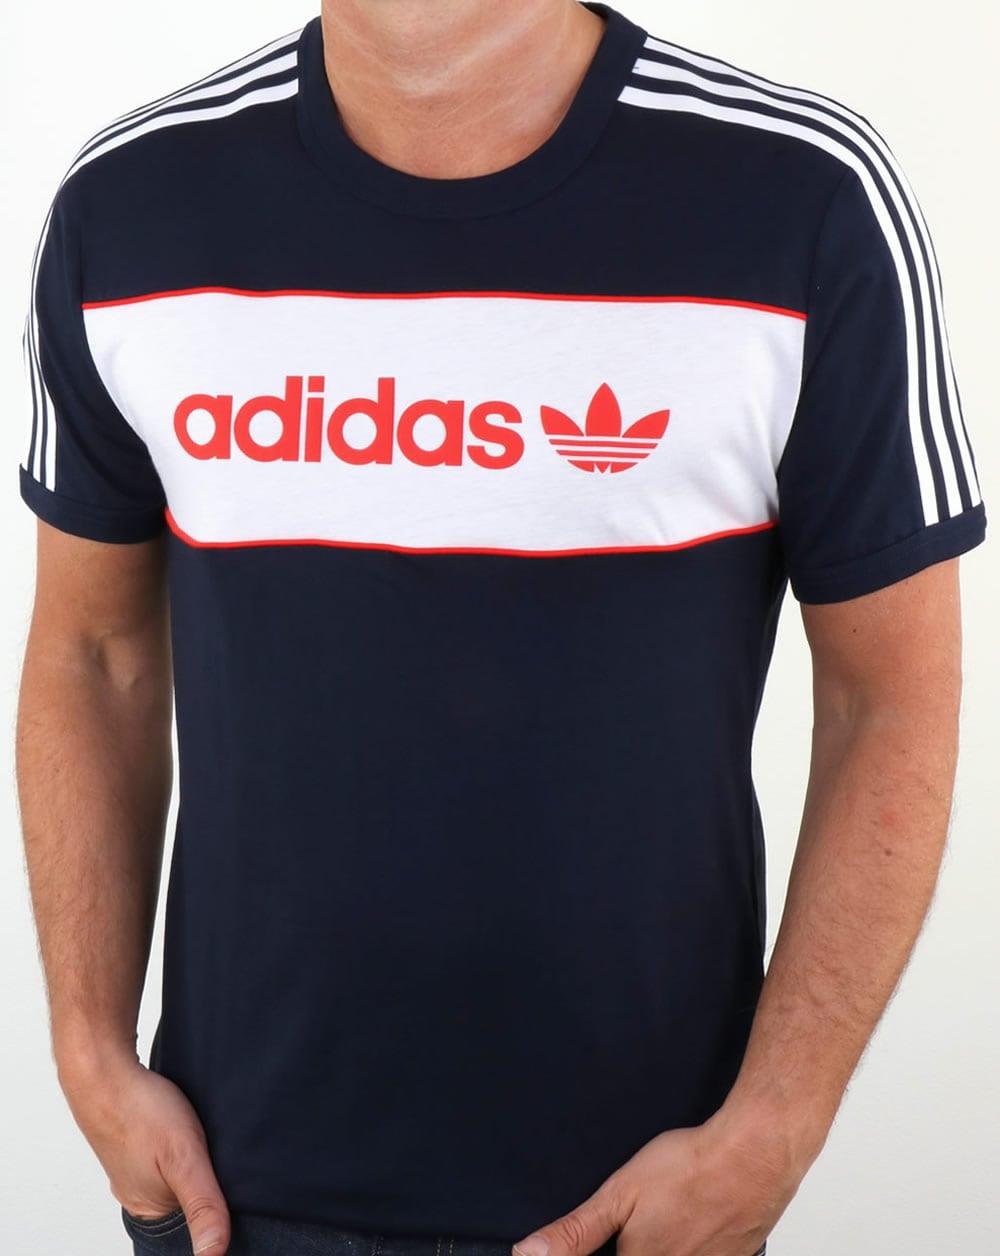 Adidas Originals Block T Shirt Navytrefoilcrew Necktee